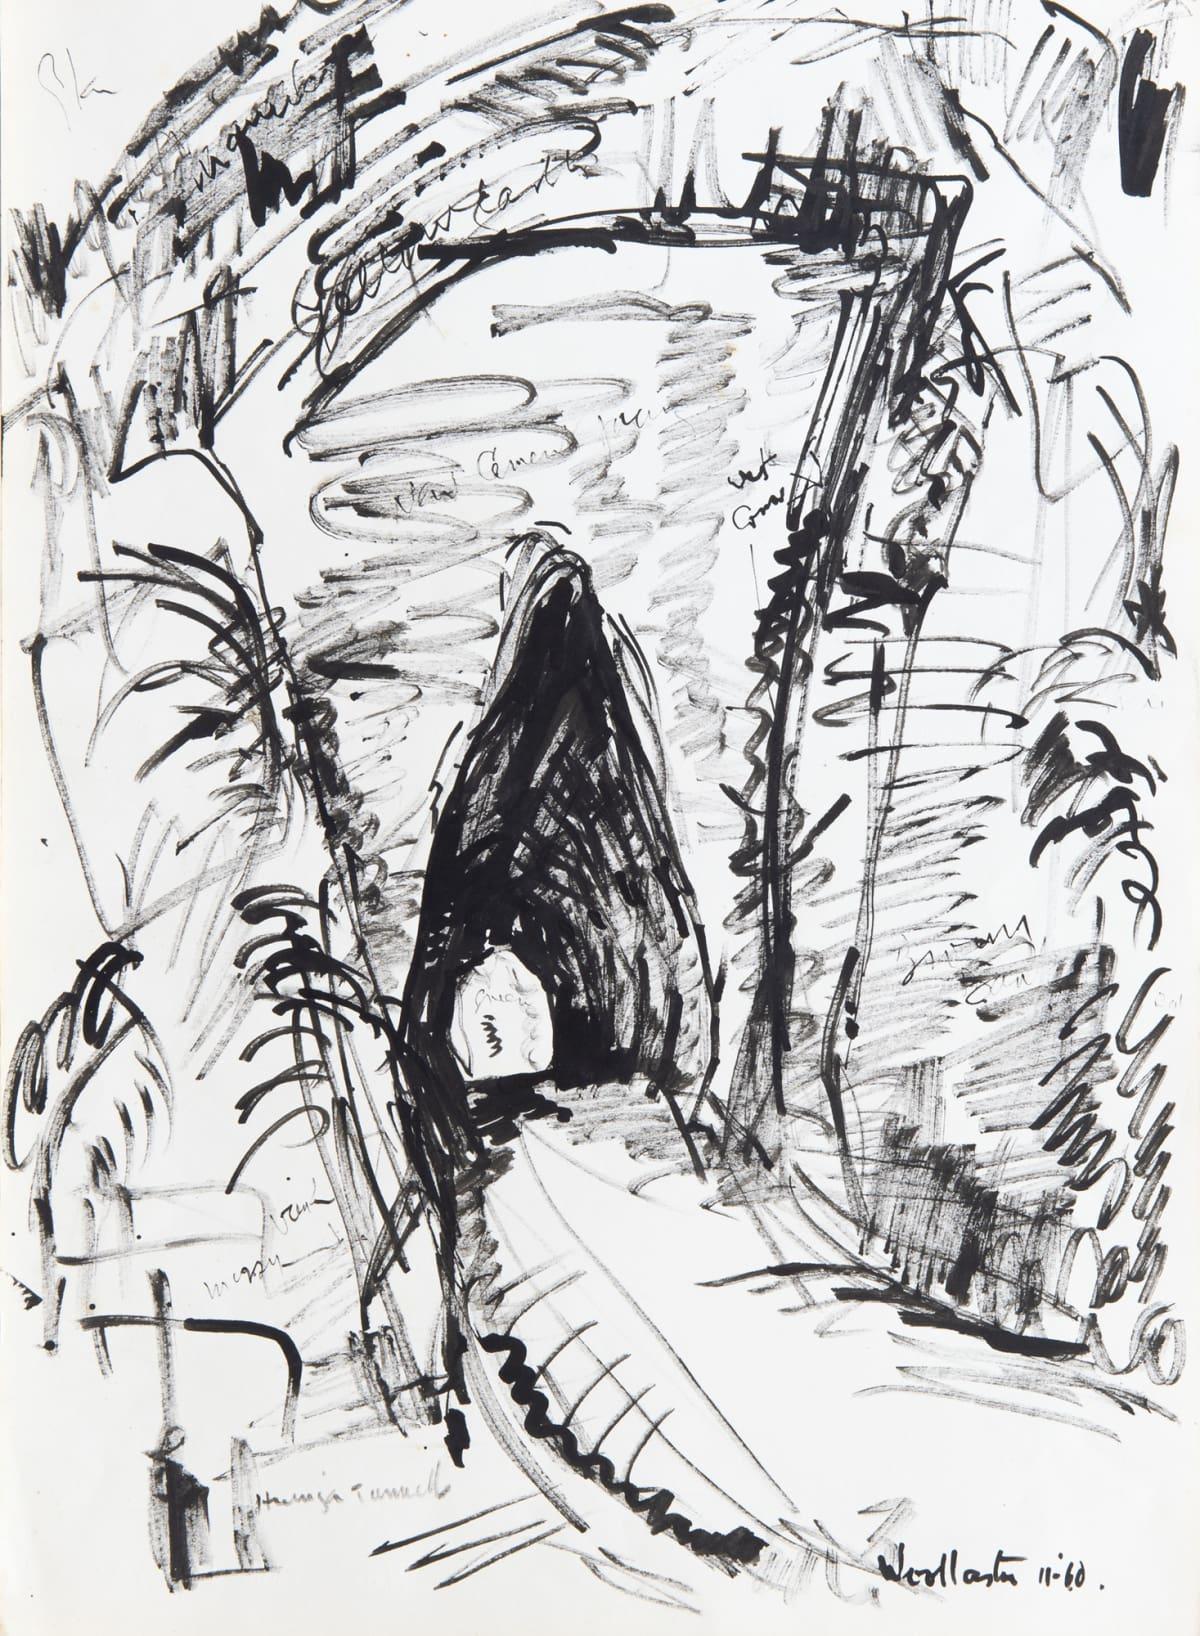 Mountford Tosswill Woollaston Huinga Tunnel, 1960 ink on paper 375mm x 275mm